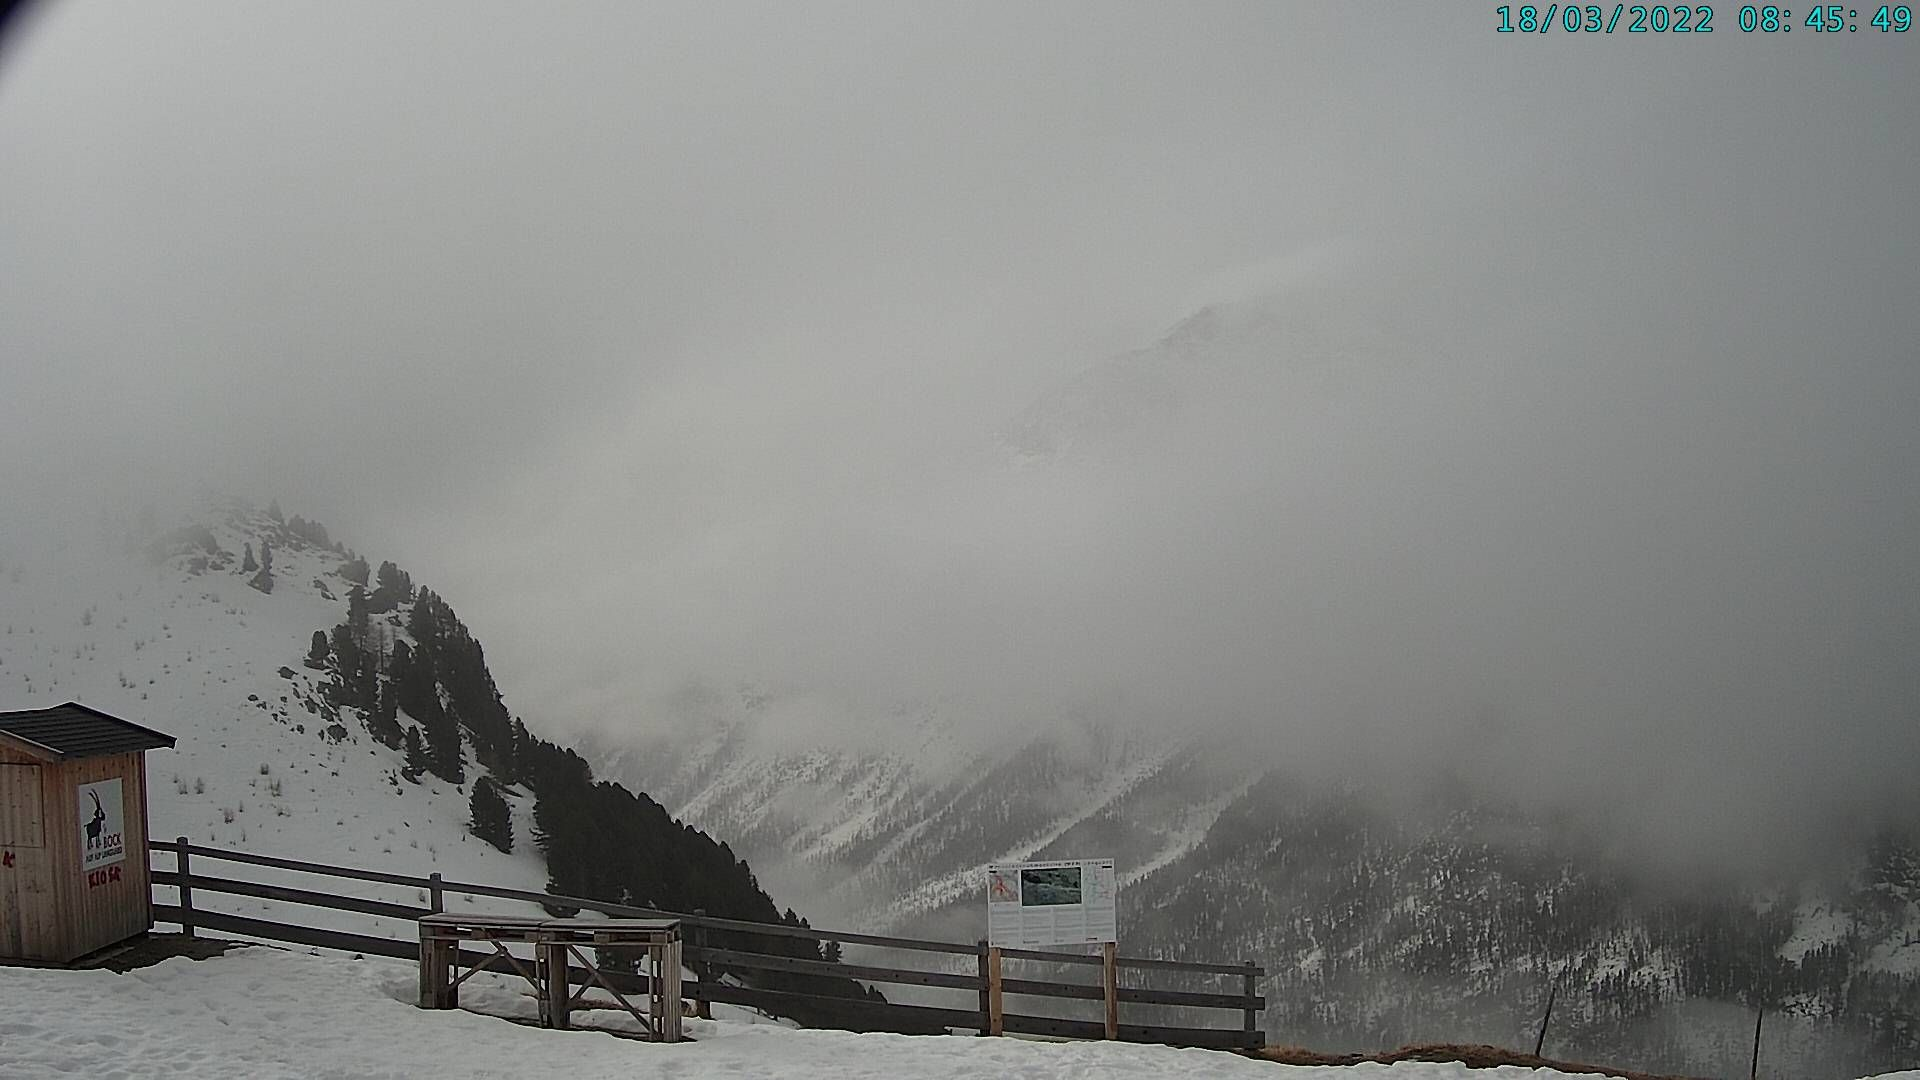 Pontresina: Engadin St. Moritz - Ausblick Restaurant Languard